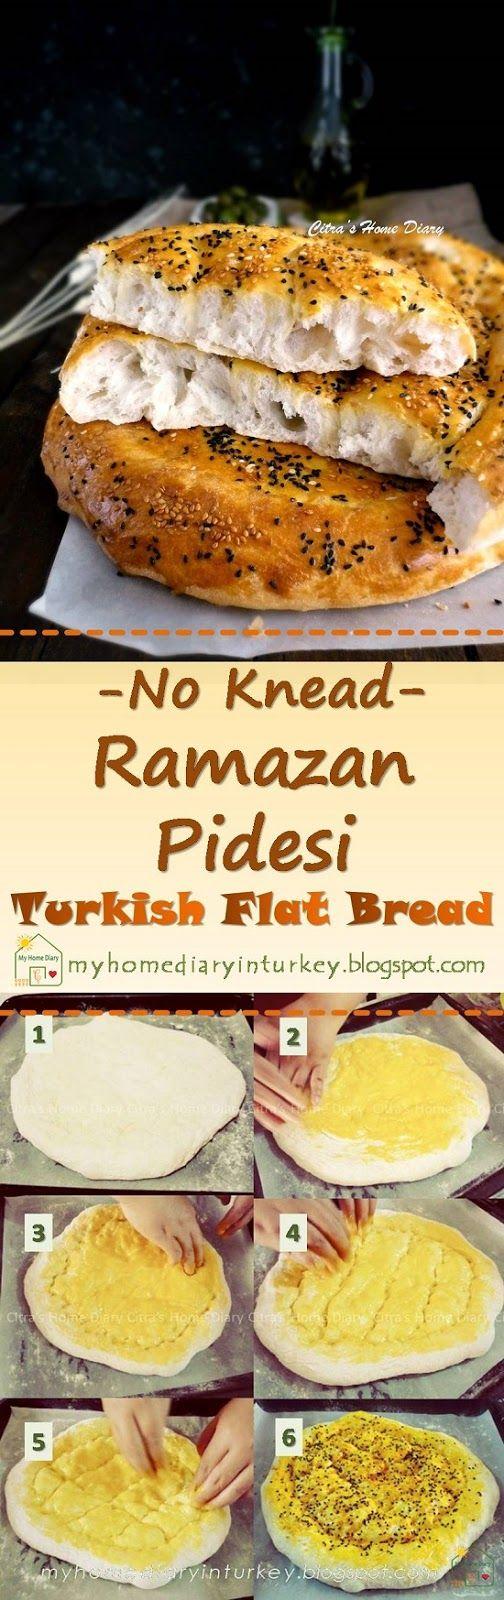 No knead Ramazan Pidesi / Turkish Pide bread (flat bread ...